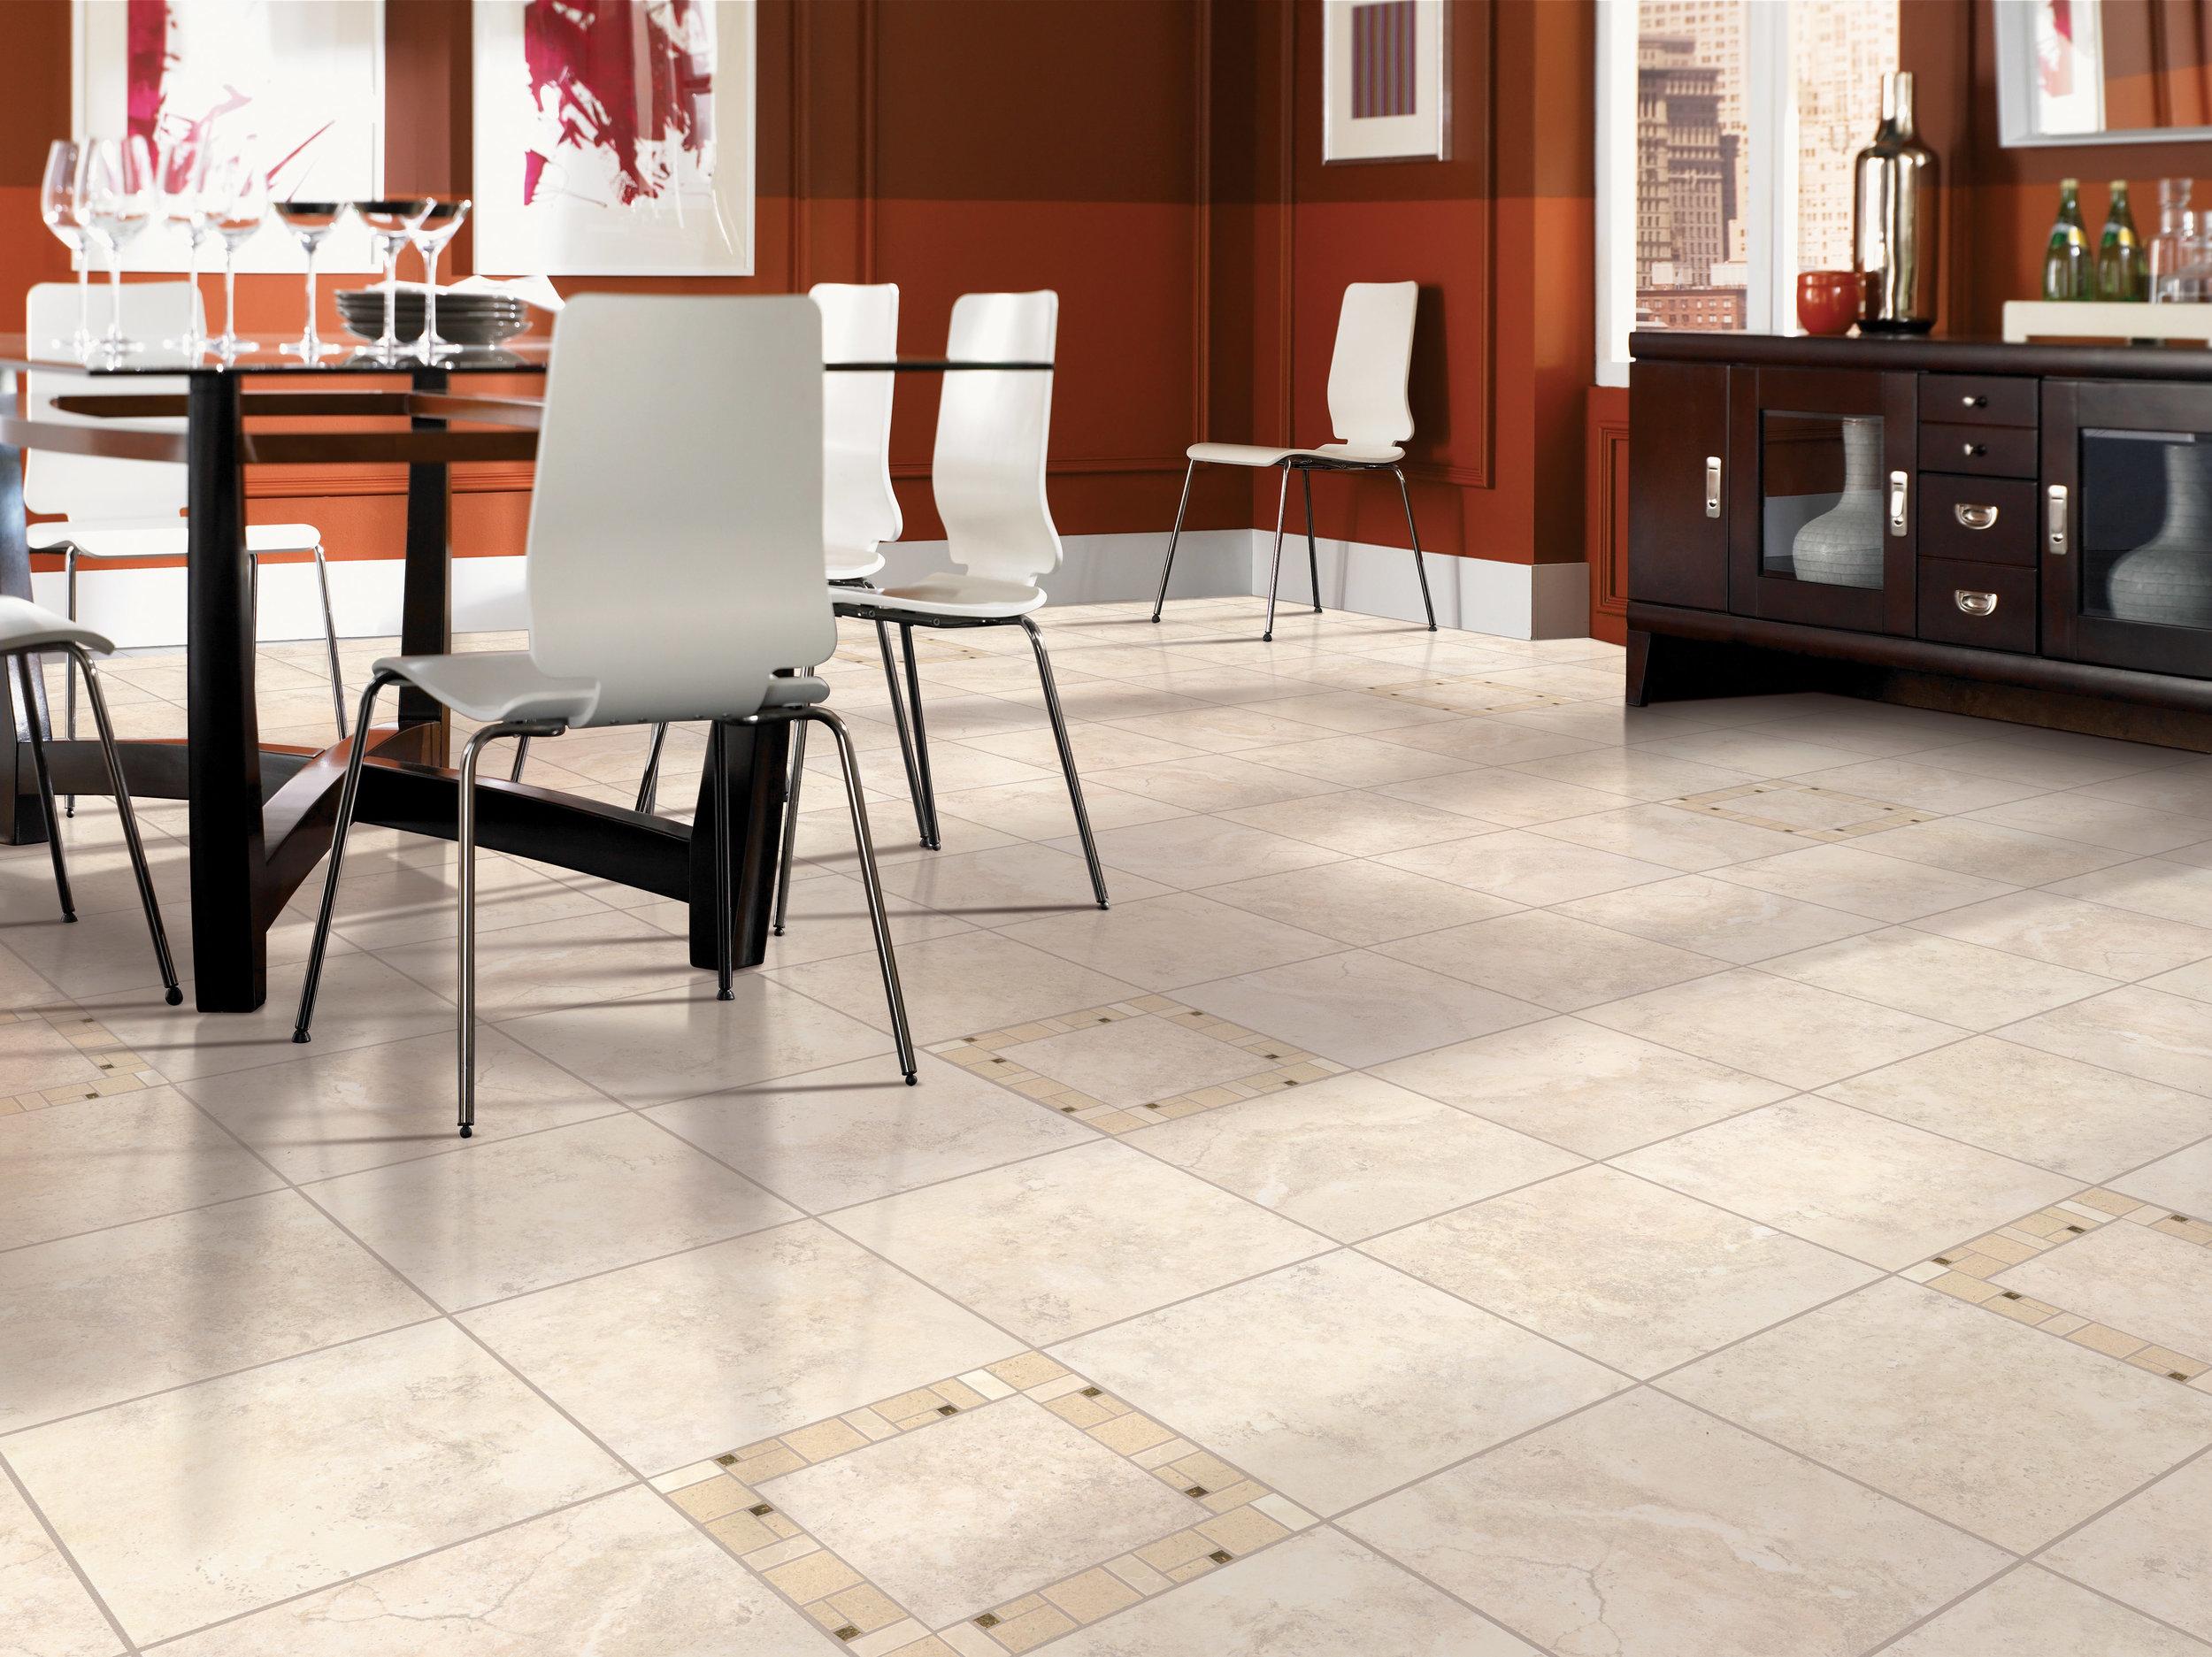 Luxury Vinyl Tile Flooring by Divine hardwood & stone